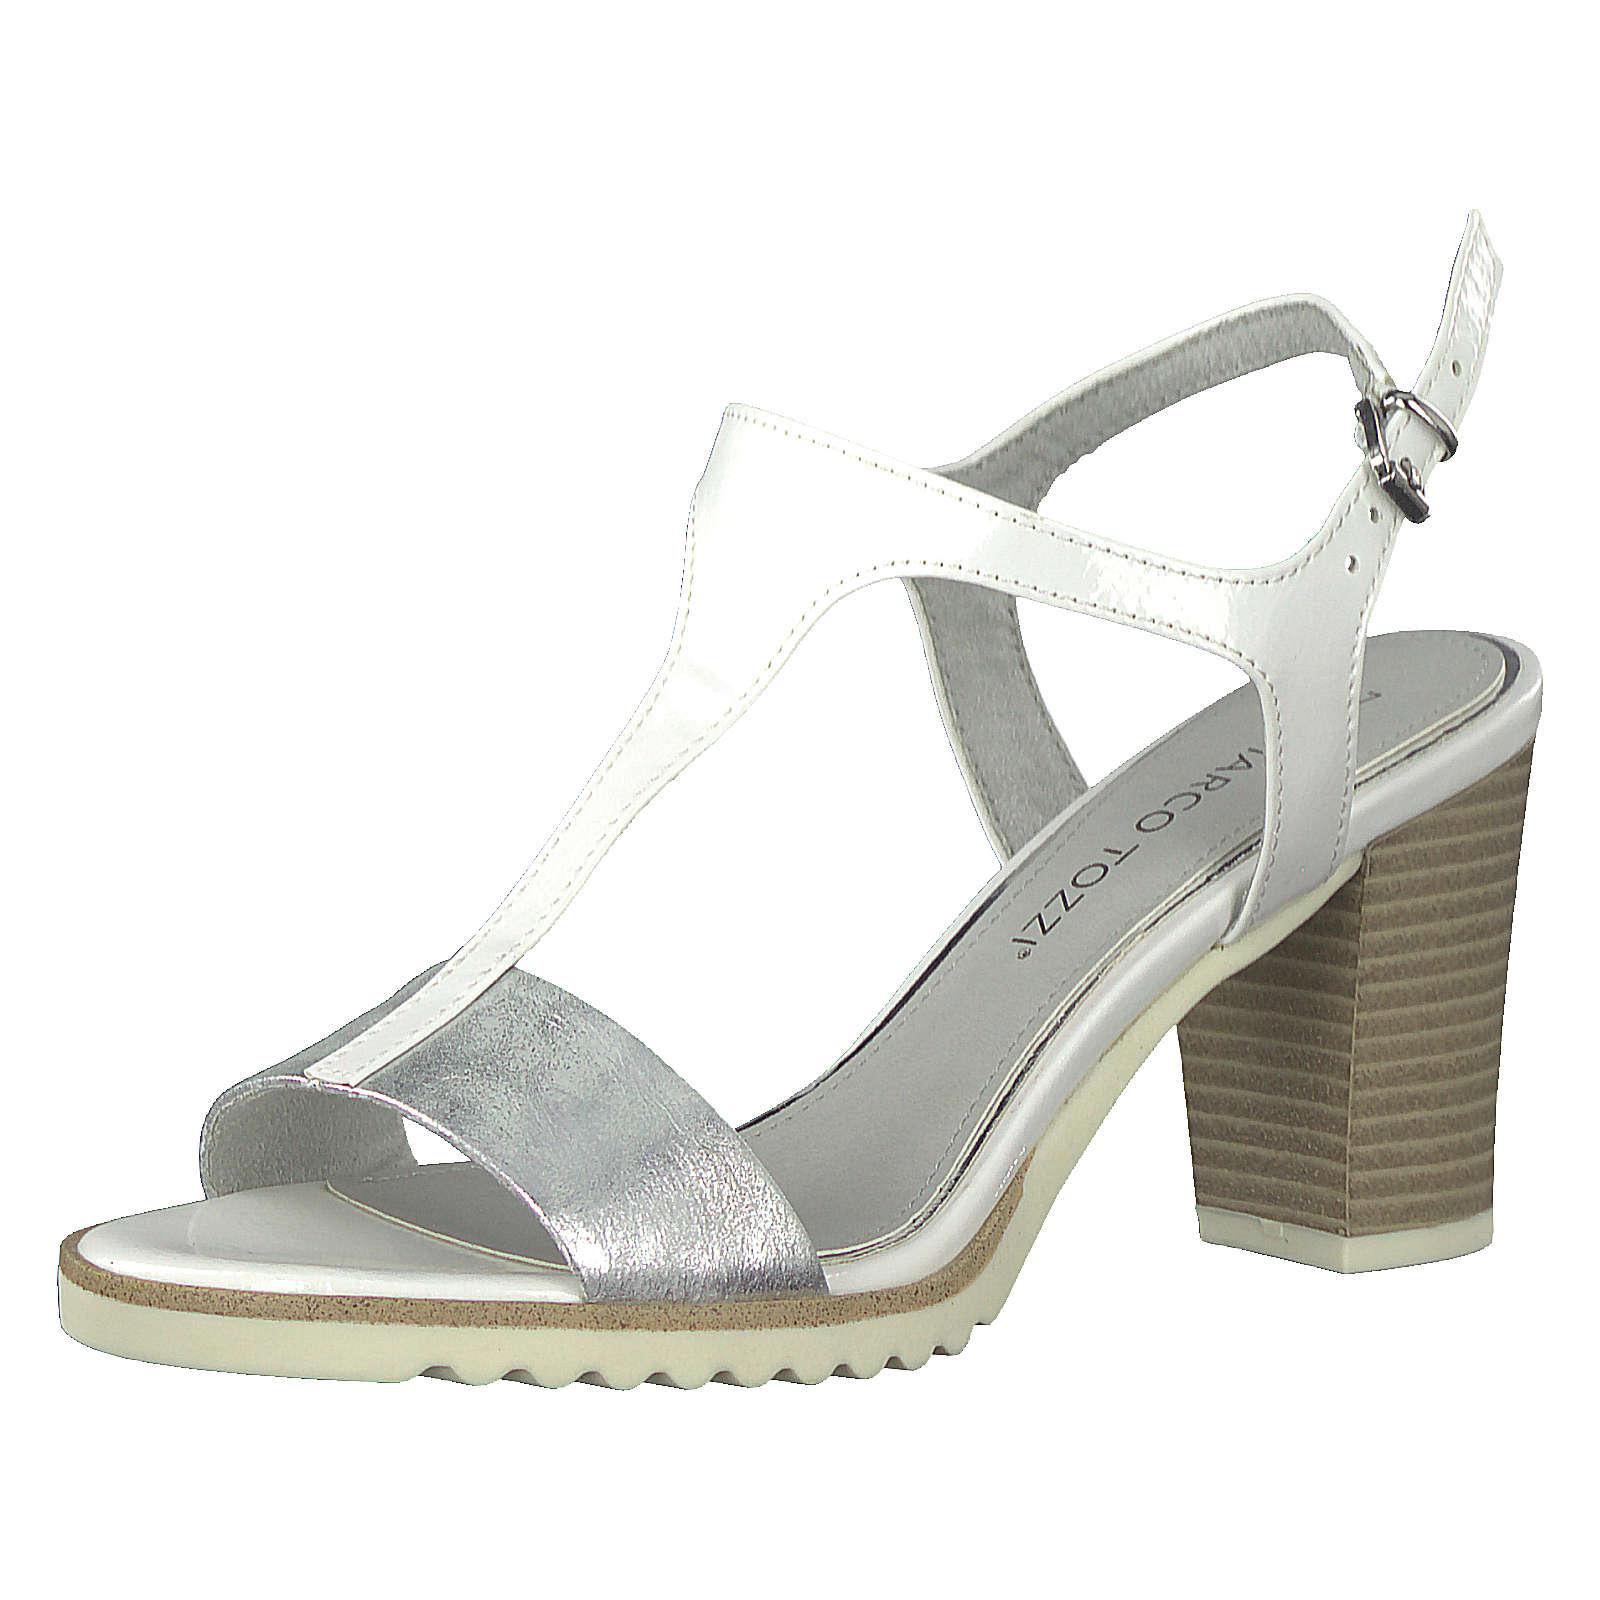 MARCO TOZZI Klassische Sandaletten silber Damen Gr. 38